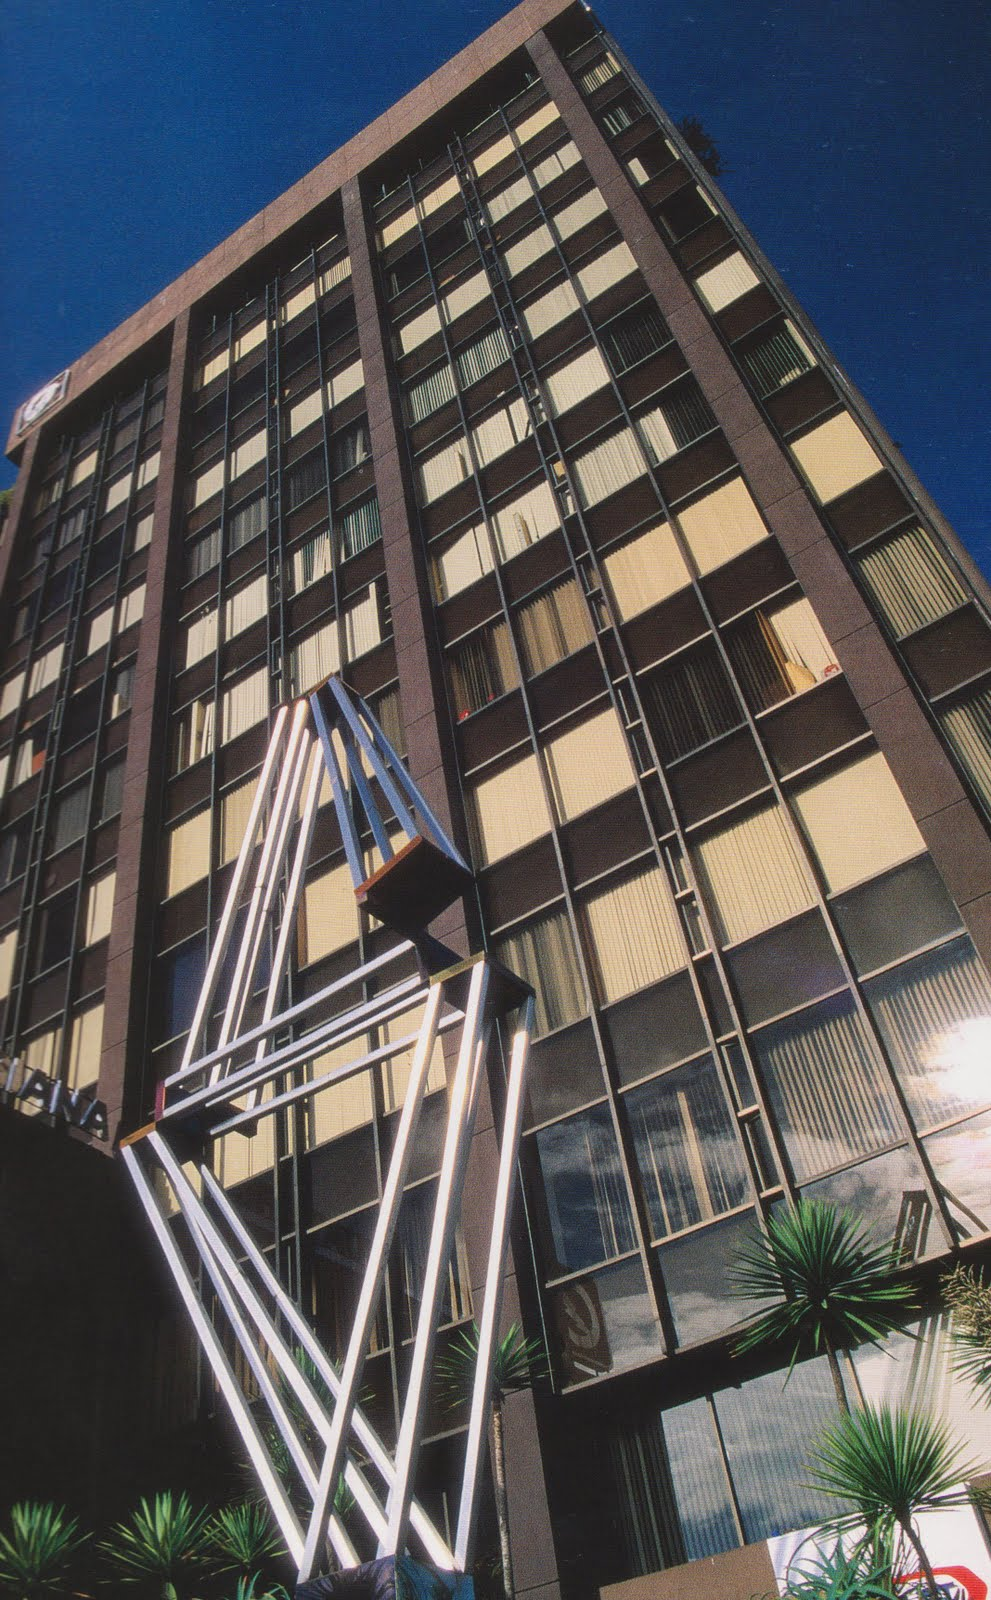 Arquitectura moderna en ecuador diego ponce for Arquitectura moderna